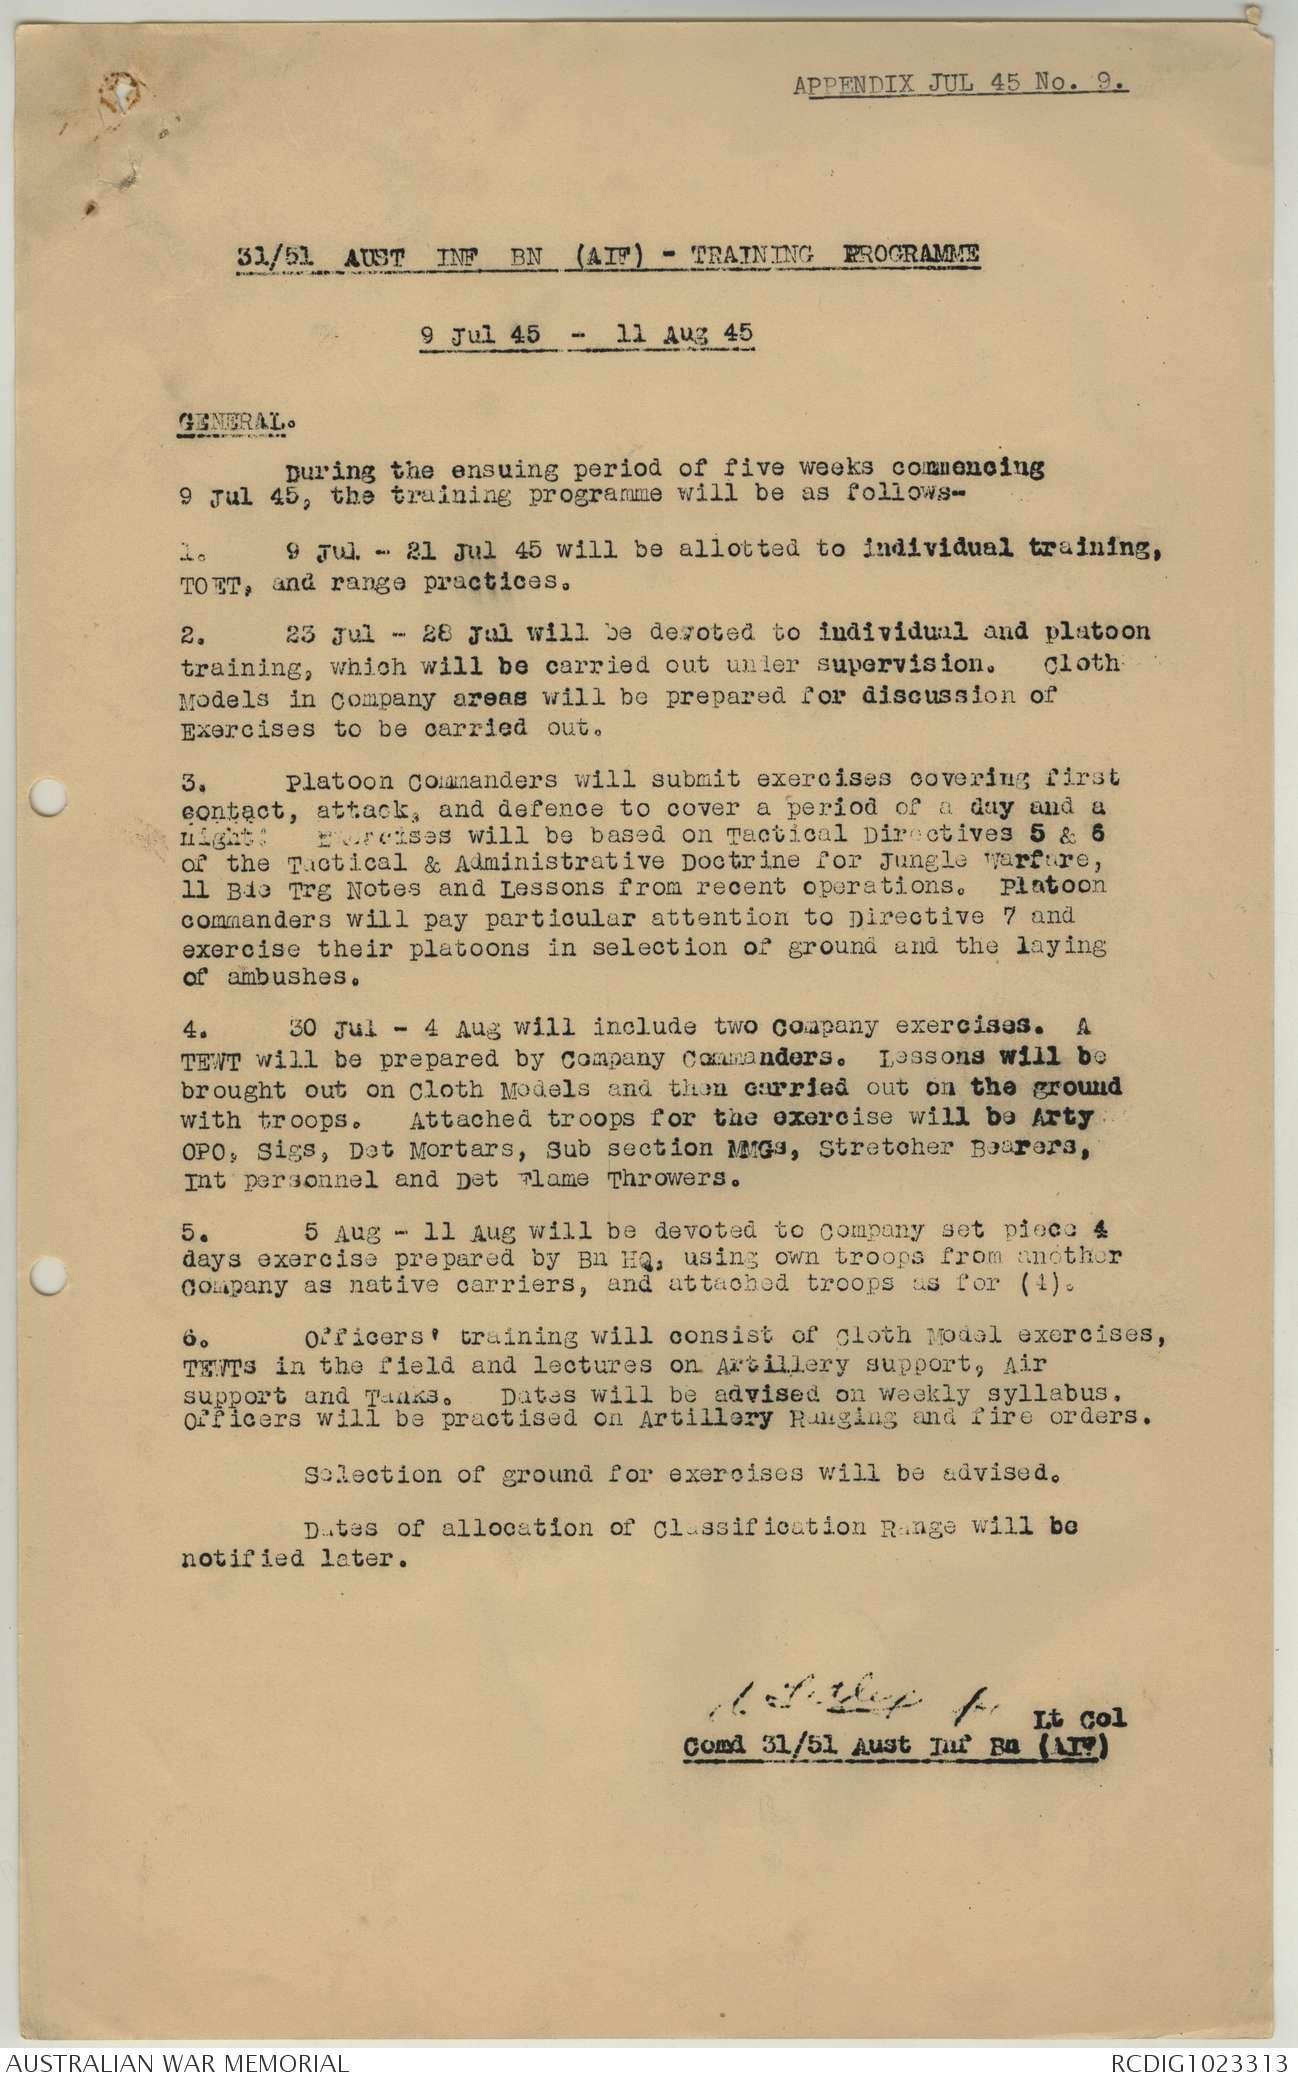 AWM52 8/3/70/39 - July 1945 | The Australian War Memorial